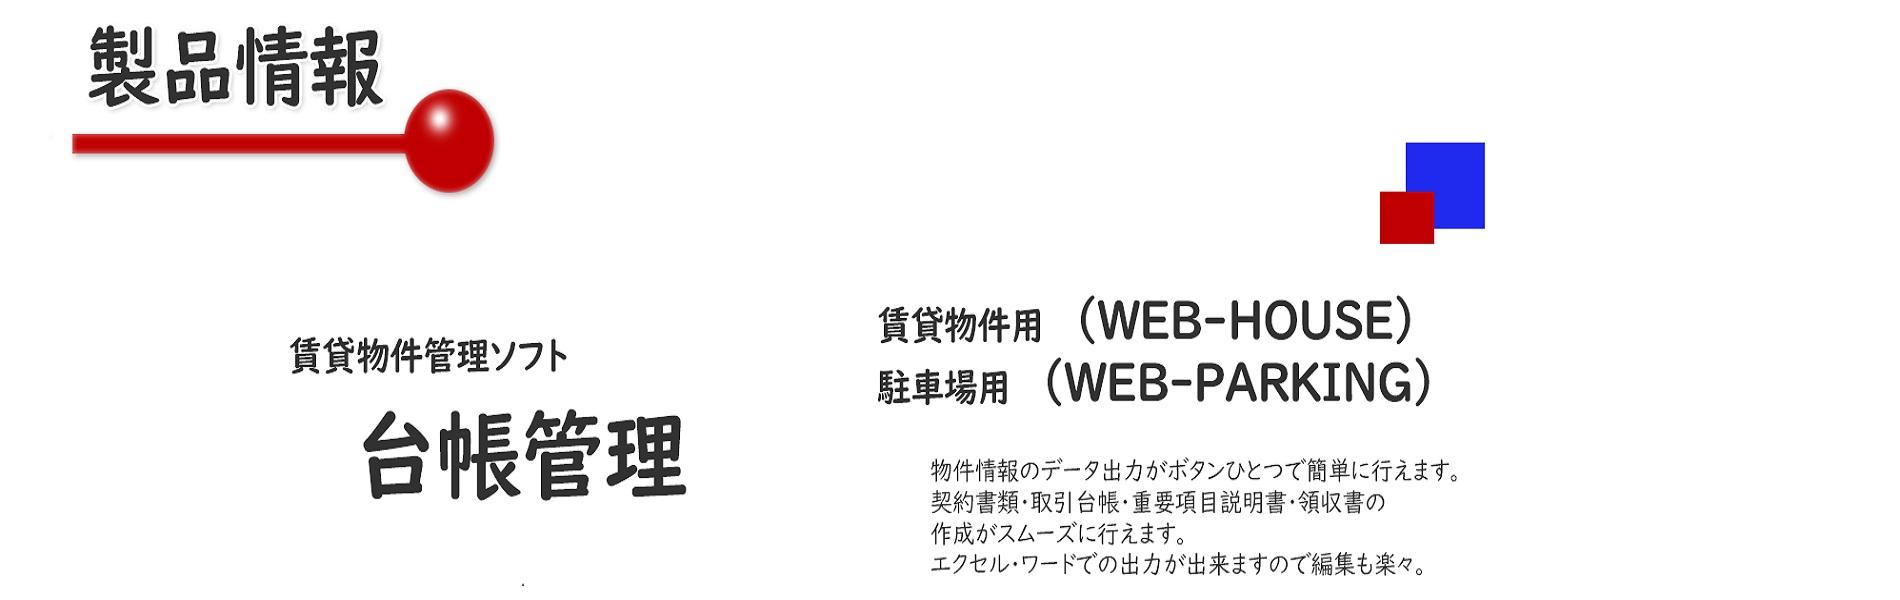 Daichou Kanri Advertising text